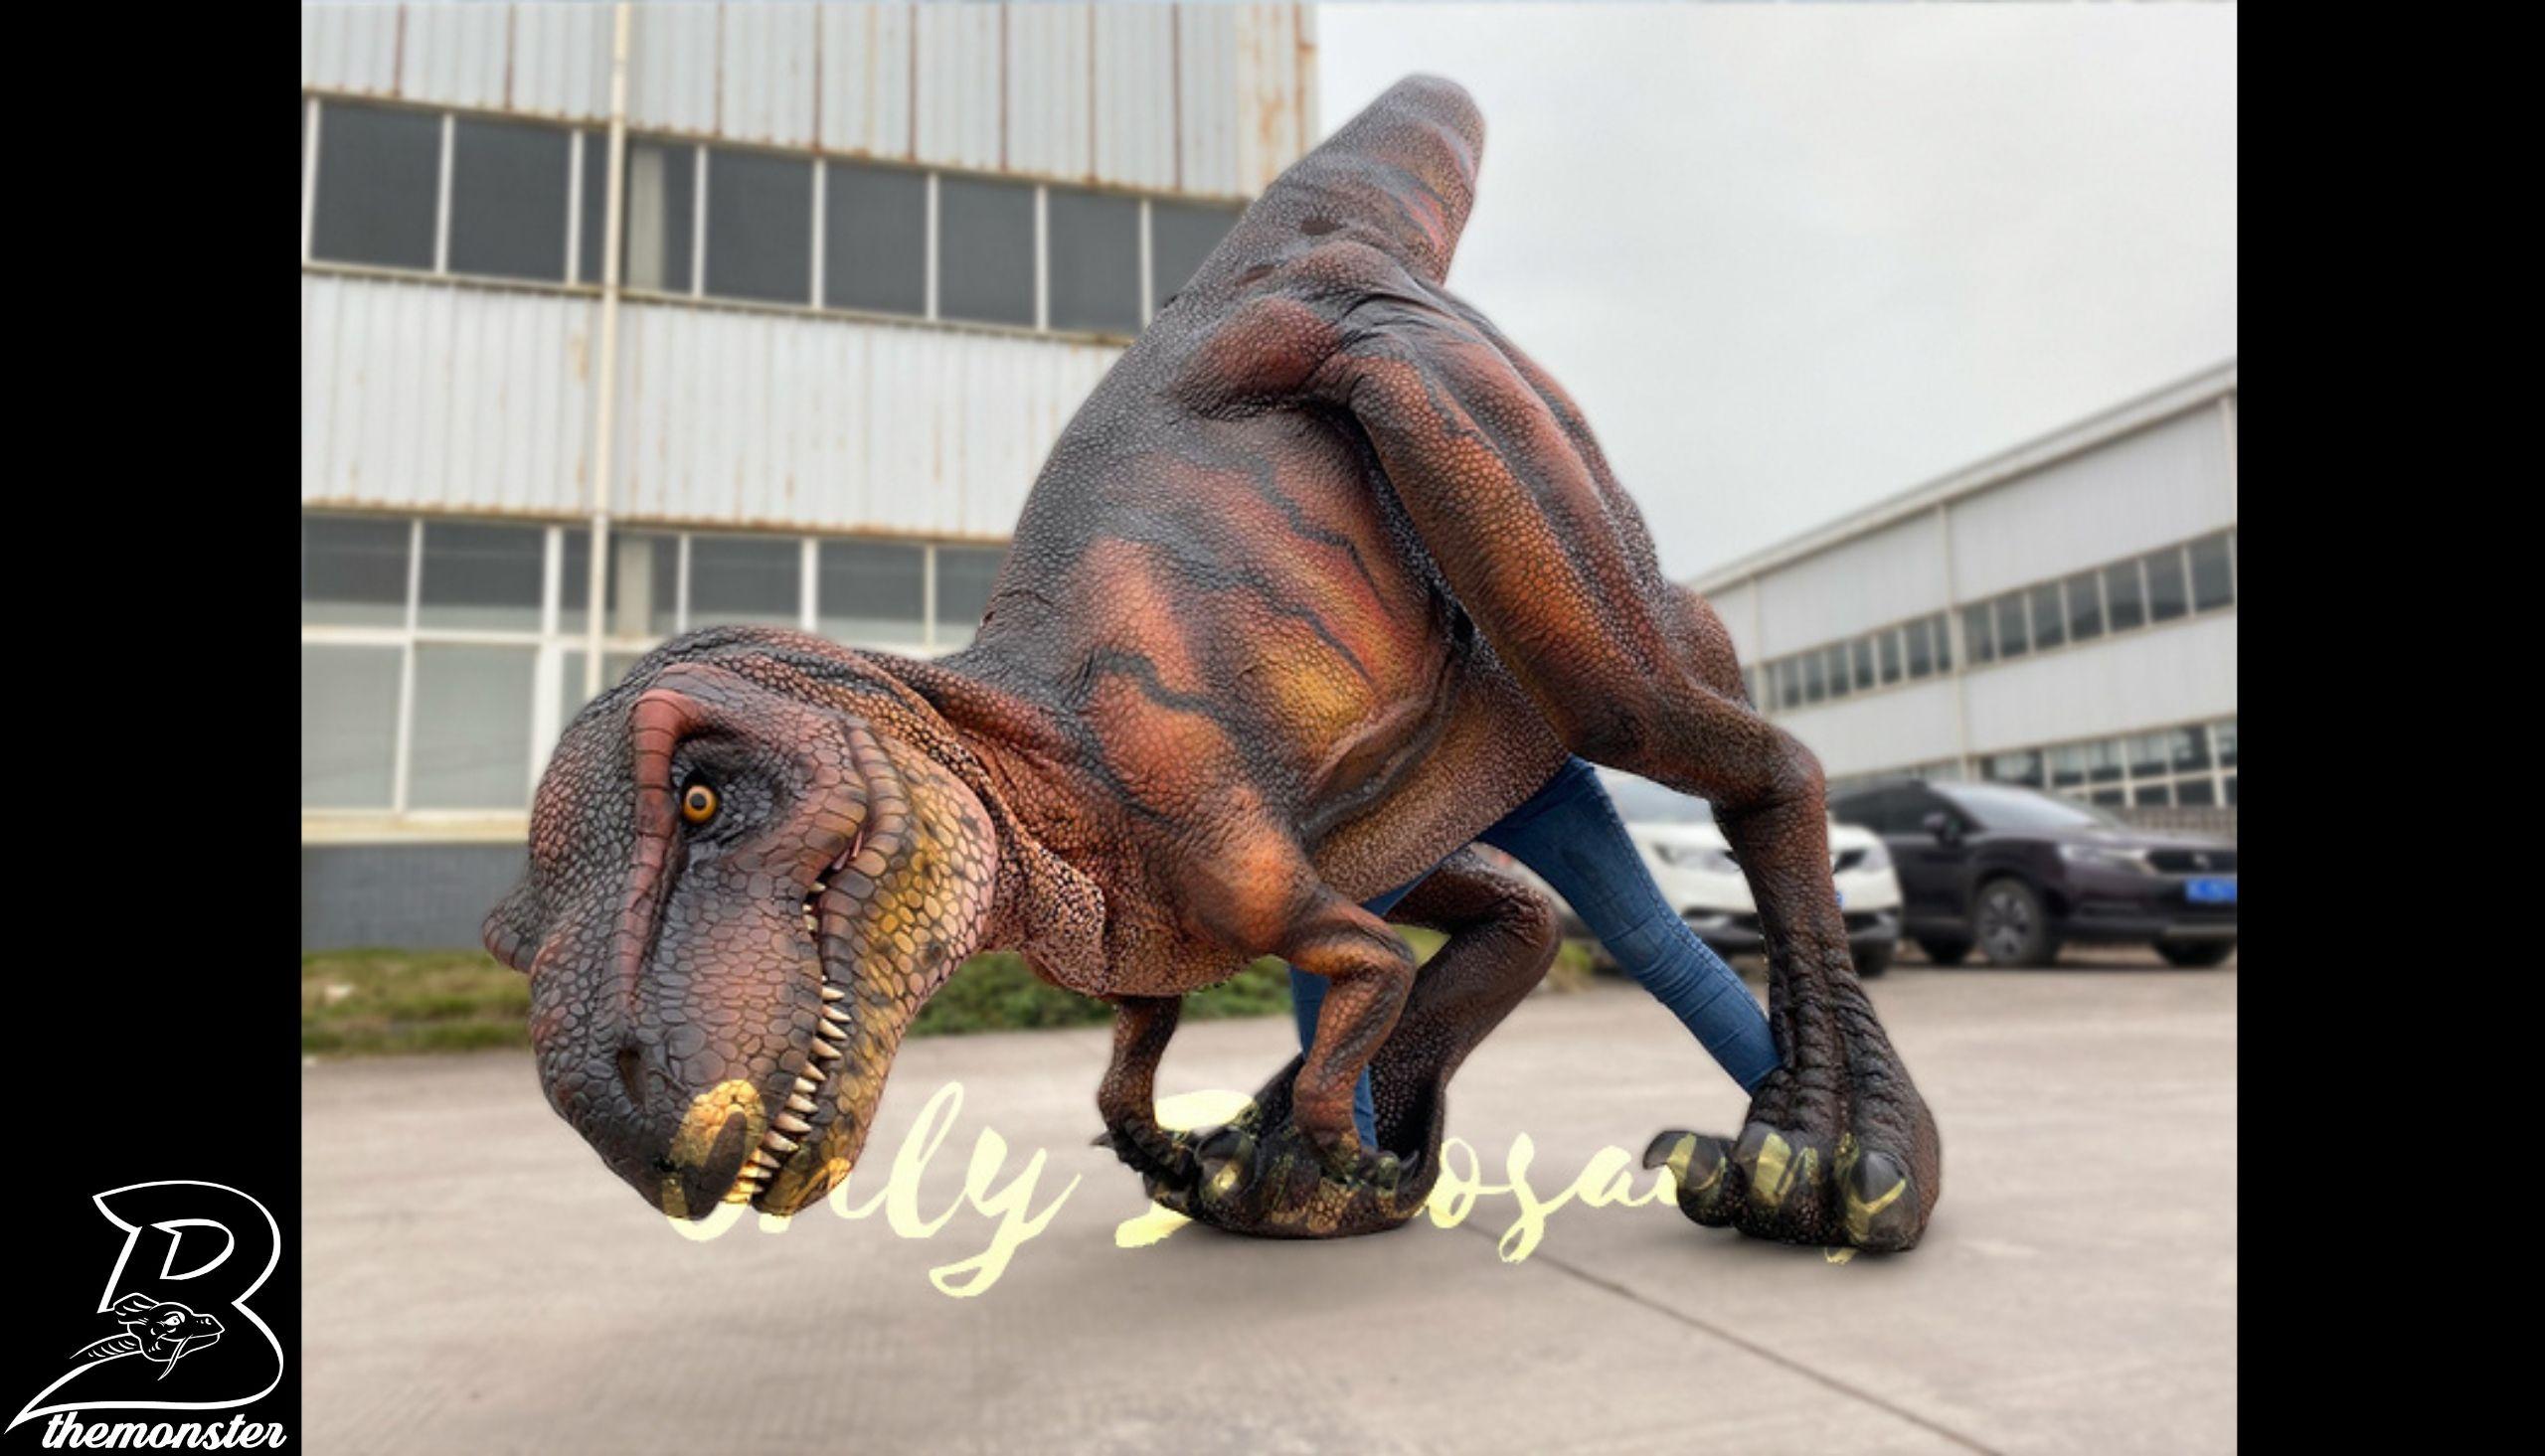 Vivid Visible Legs Tyrannosaurus Rex Dinosaur Costume in vendita sul Bthemonster.com